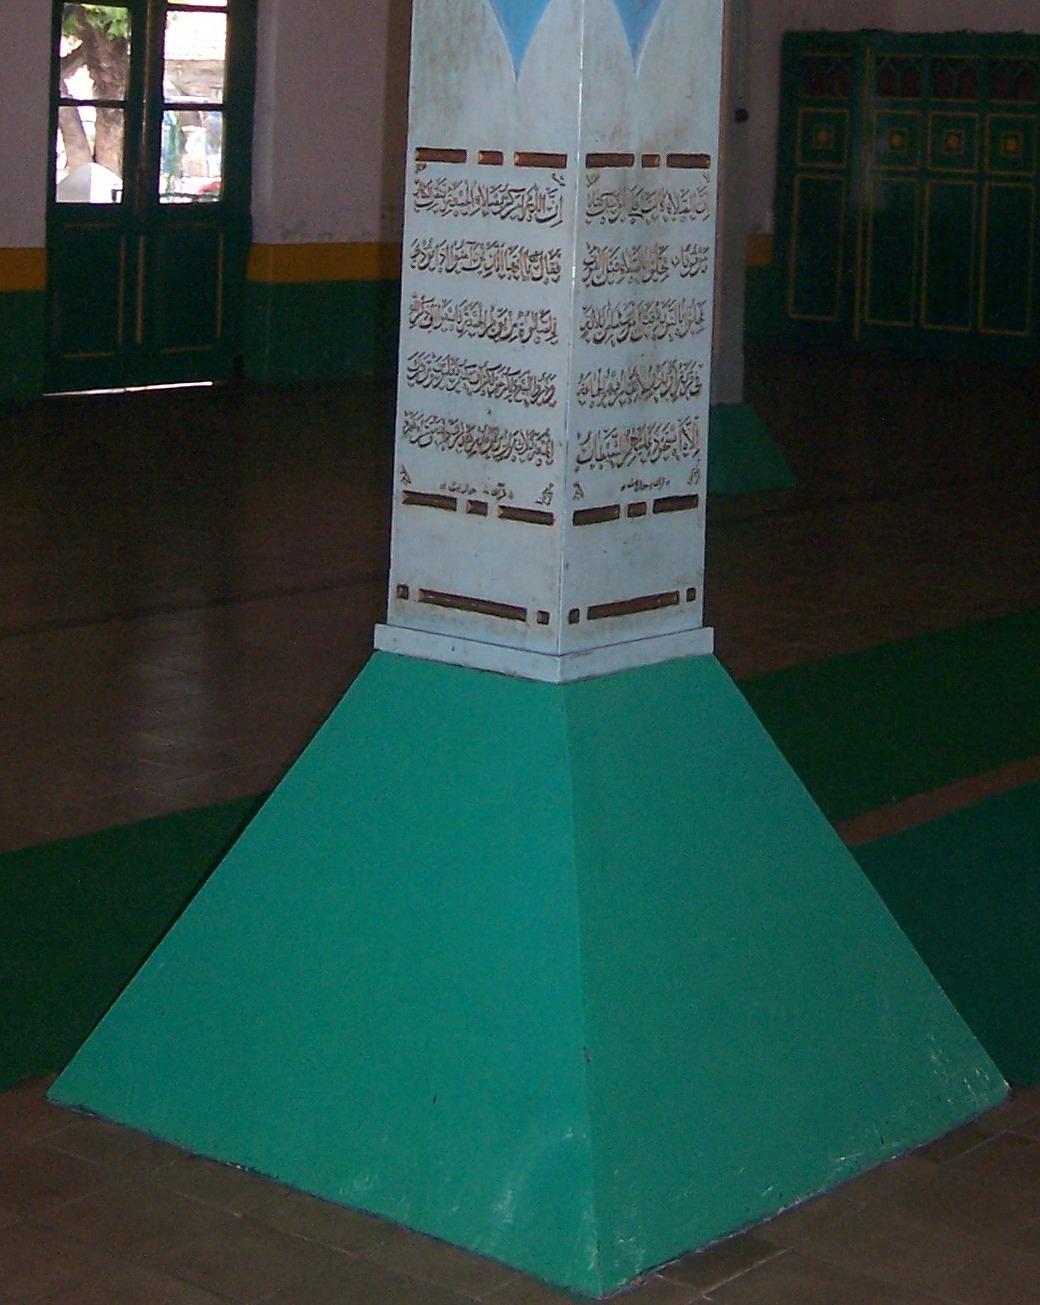 Kaligrafi pada masjid Mangkunegaran